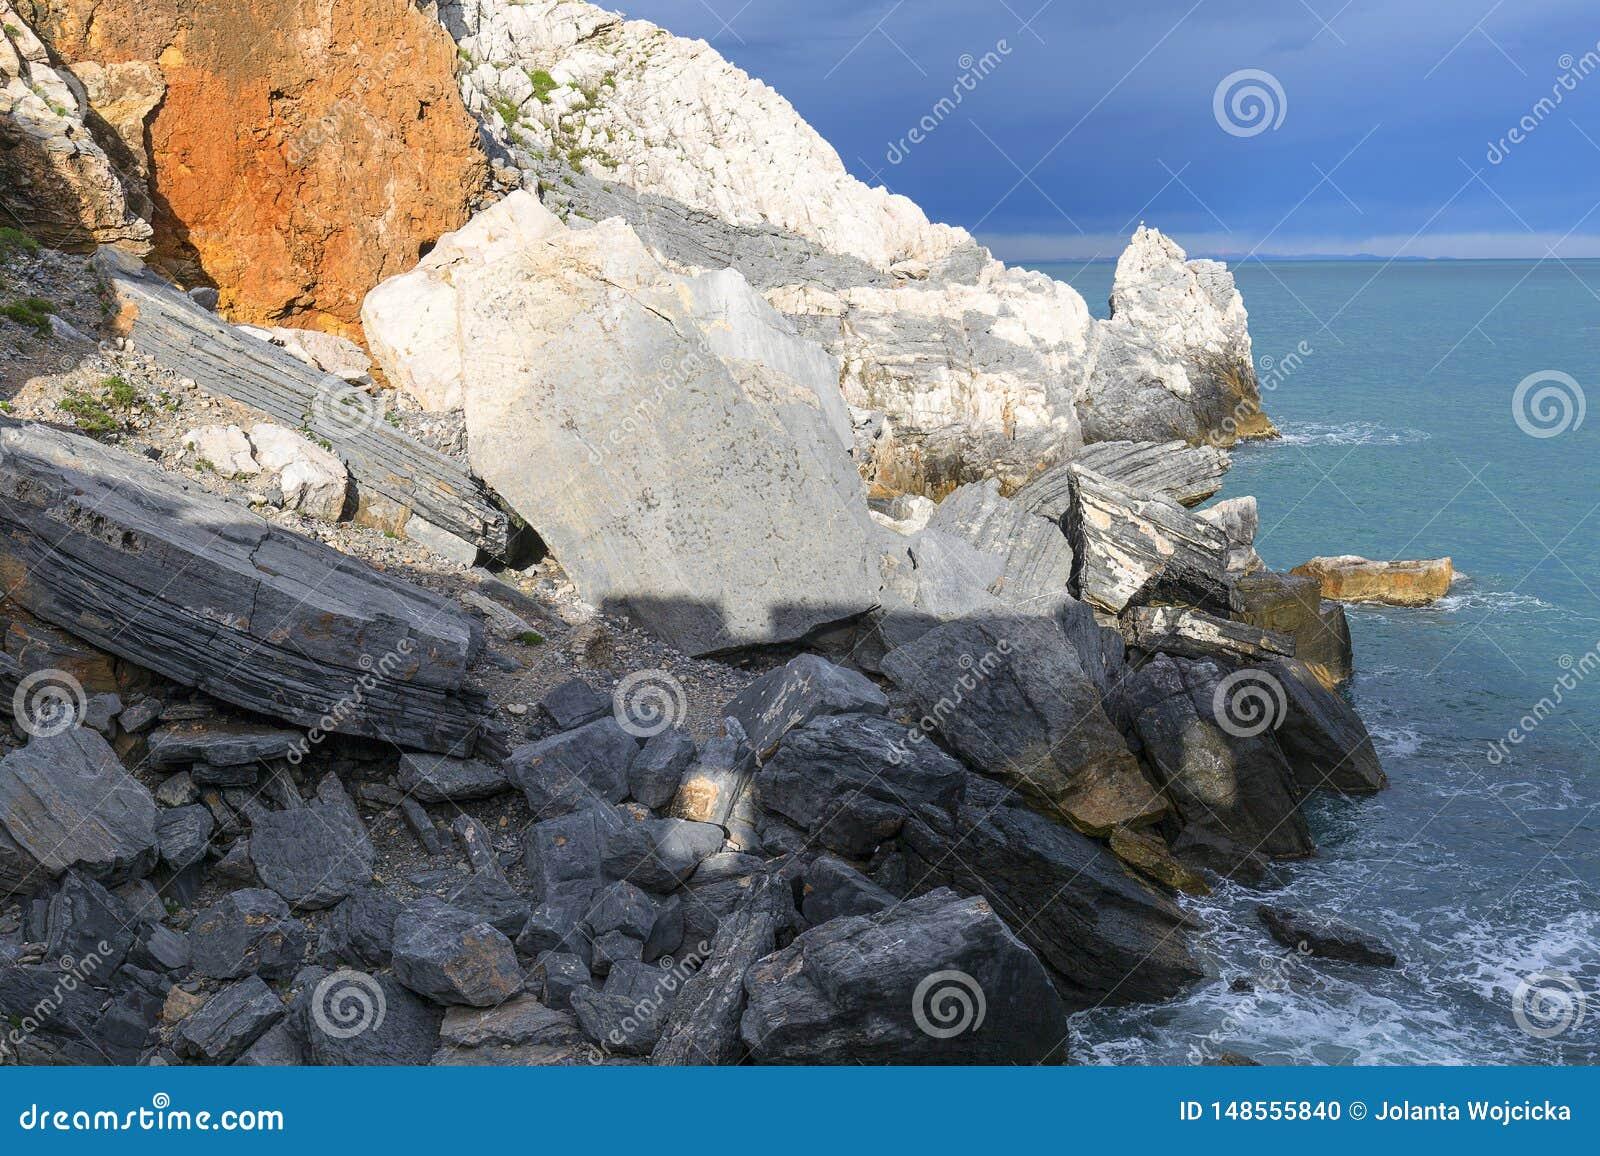 Sikt på Byron Grotto i fjärden av poeter, Portovenere, italienare Riviera, Italien